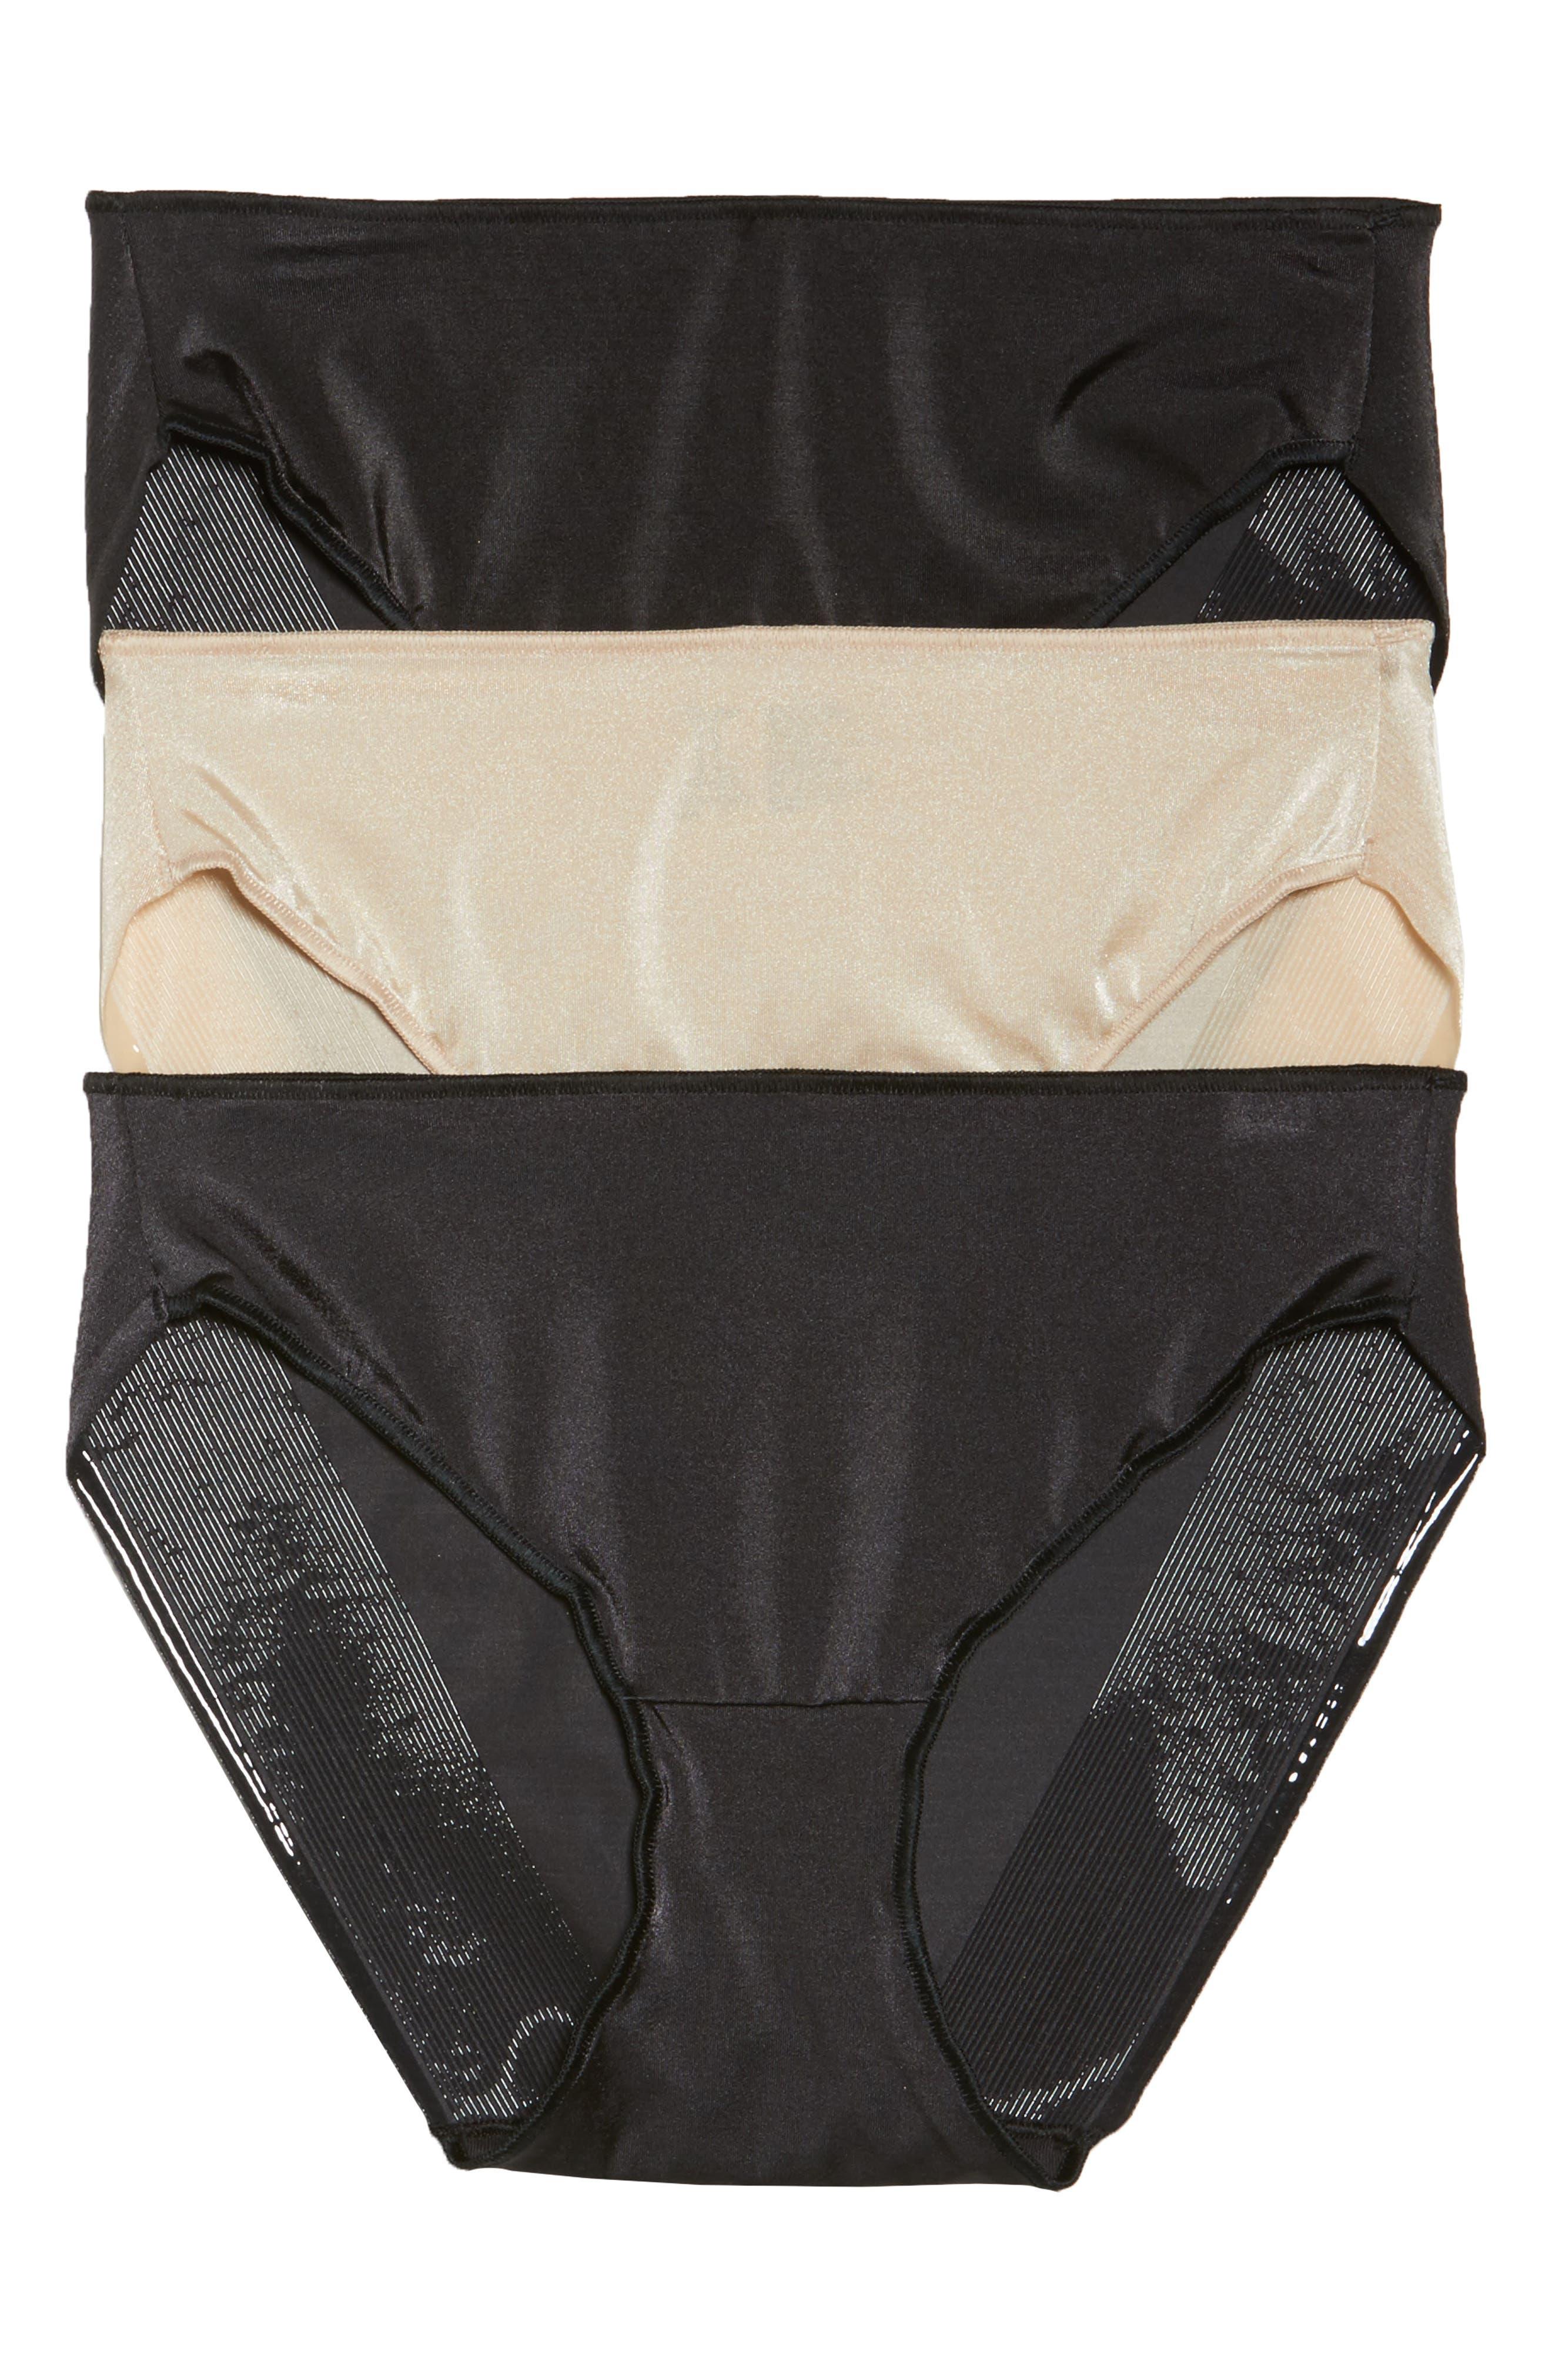 3-Pack Hipster Panties,                         Main,                         color, BLACK/ NUDE